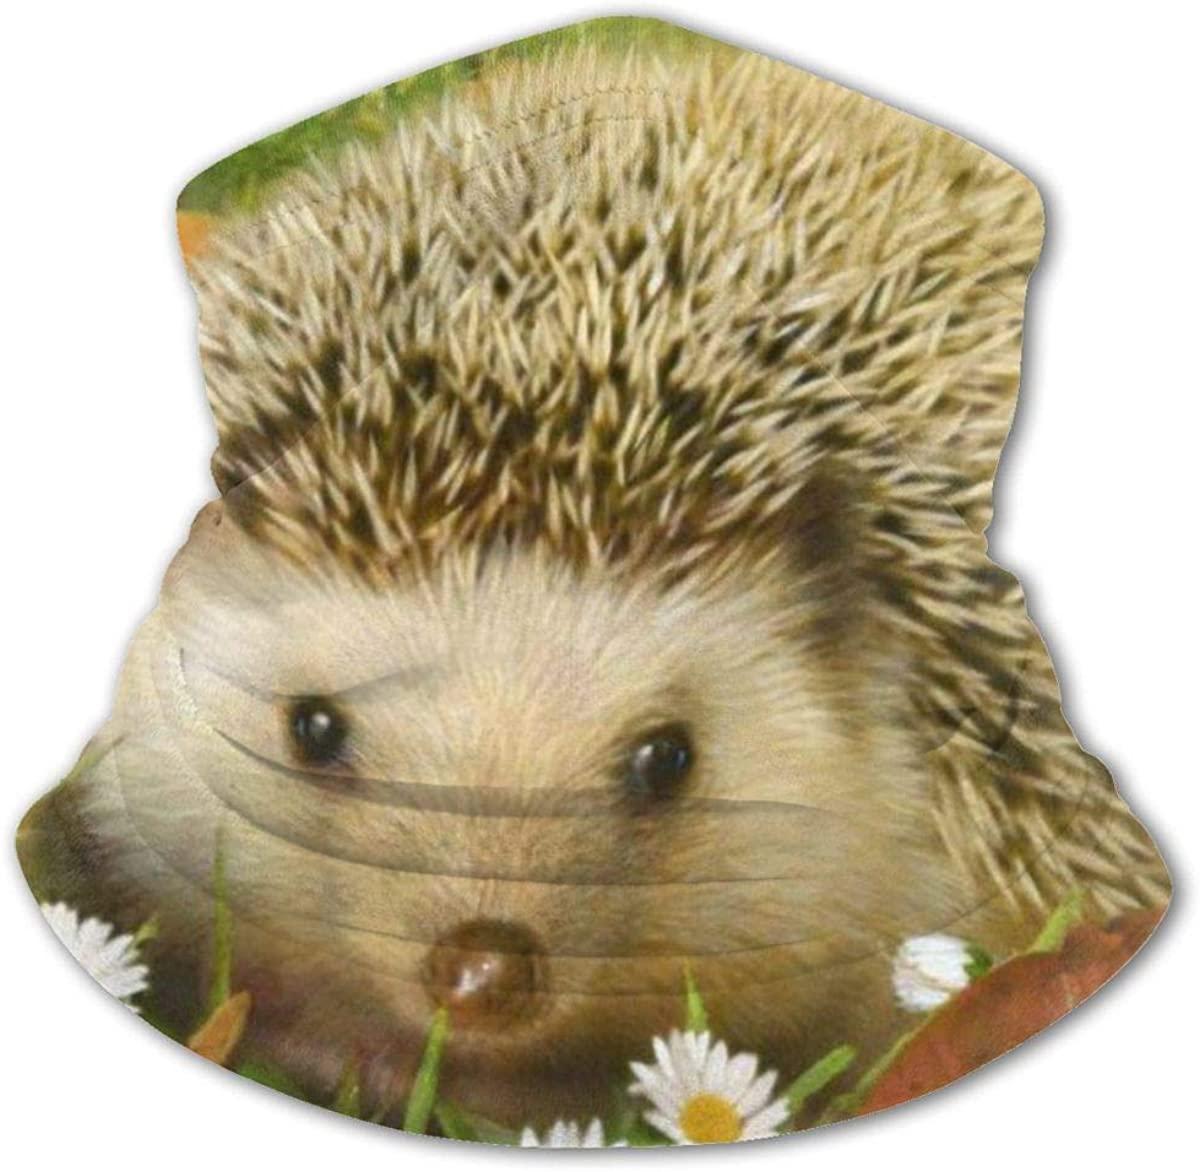 Hedgehog Headwear For Girls And Boys, Head Wrap, Neck Gaiter, Headband, Tenn Fishing Mask, Magic Scarf, Tube Mask, Face Bandana Mask For Camping Running Cycling